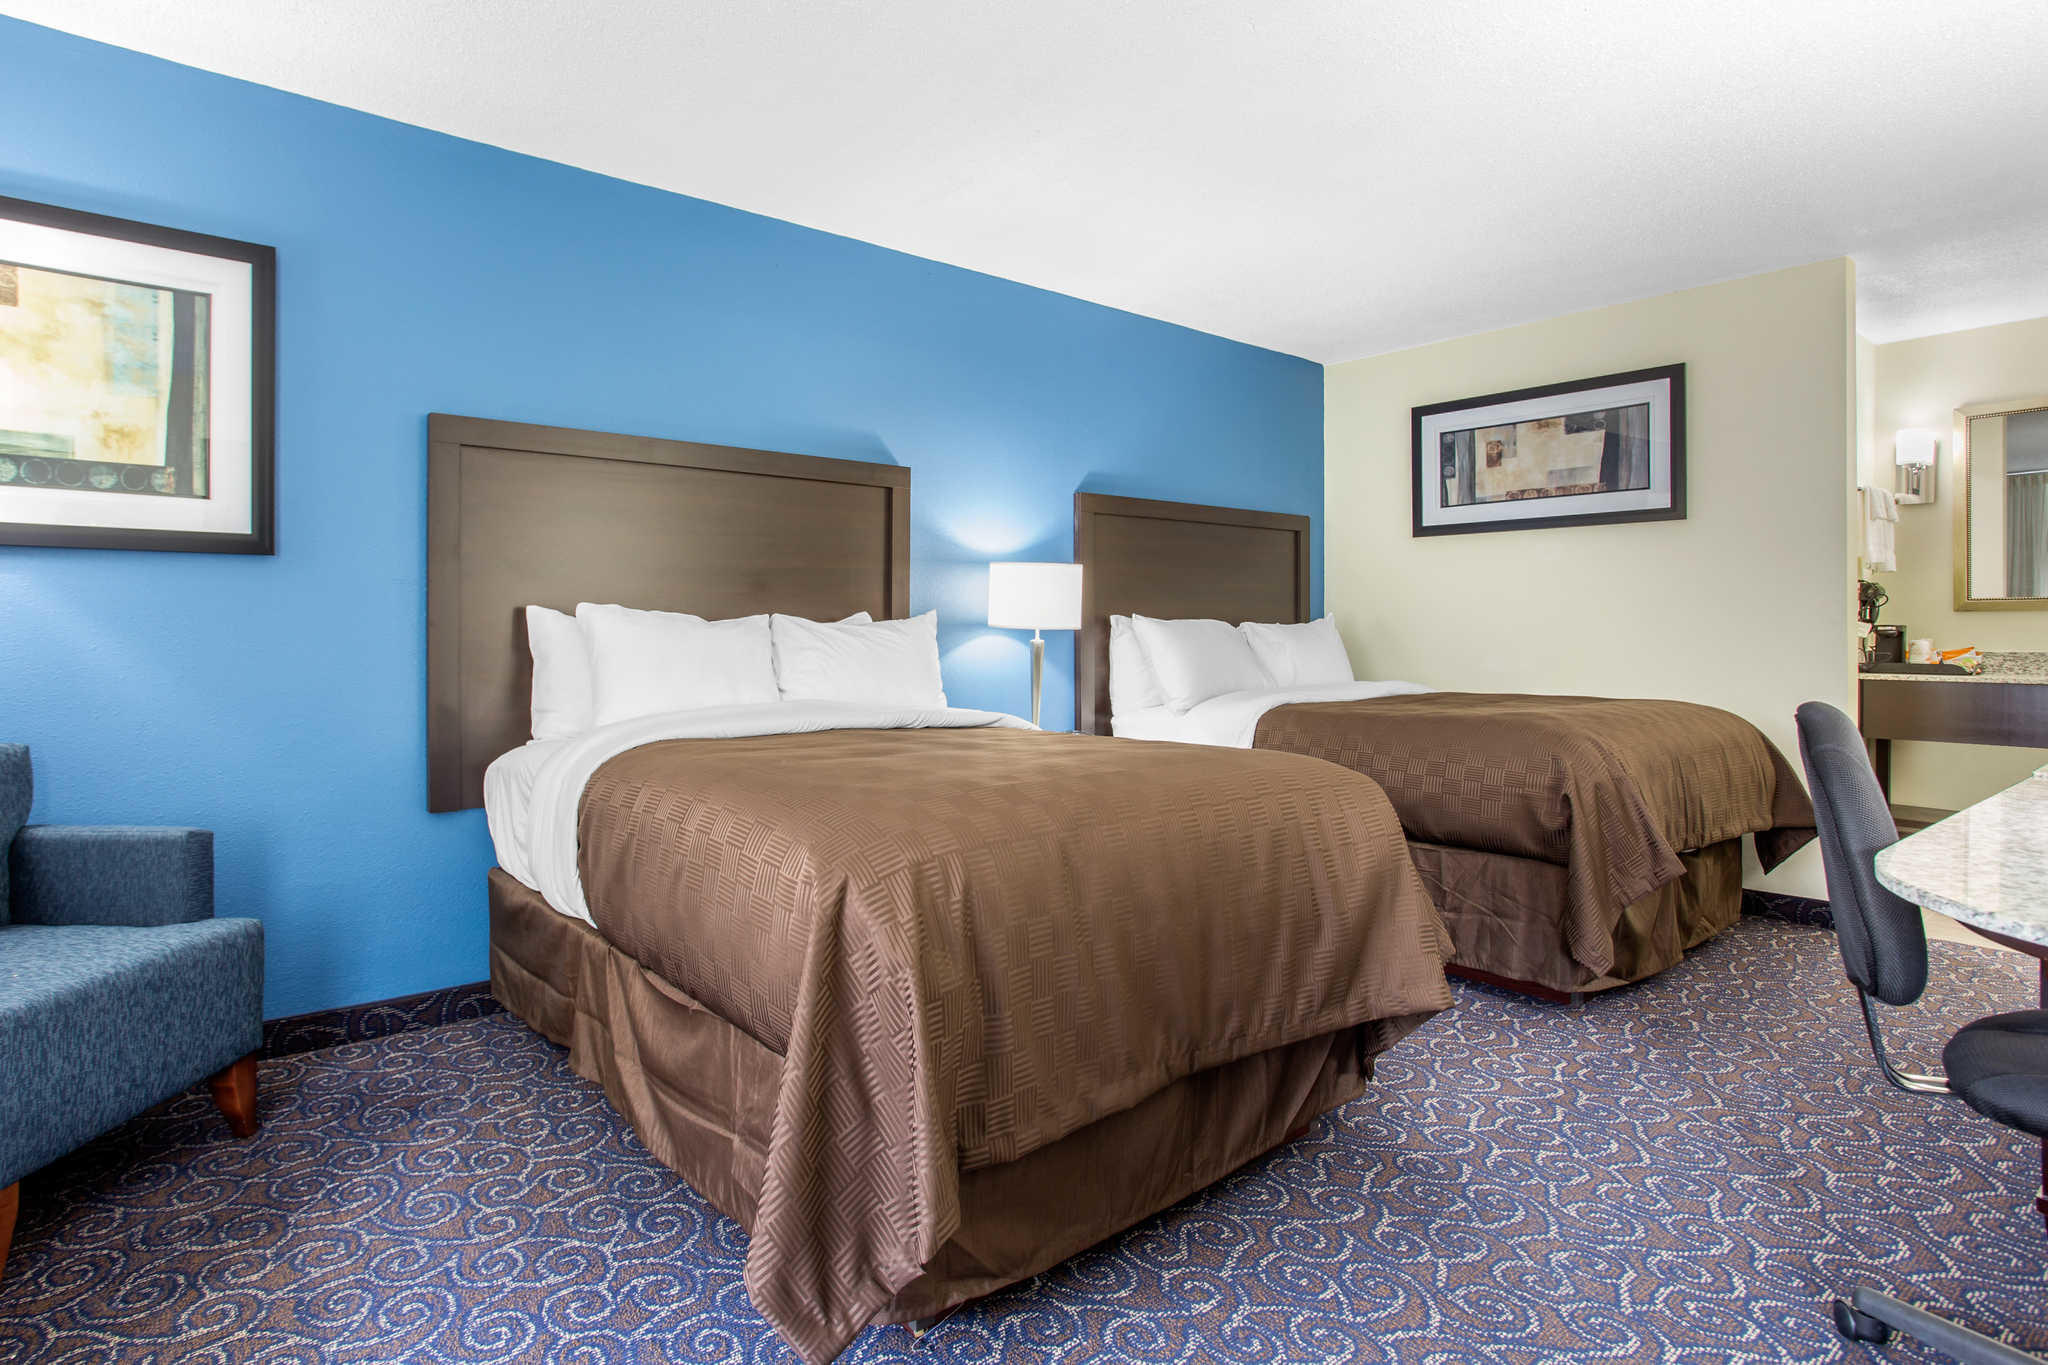 Clarion Inn & Suites image 7